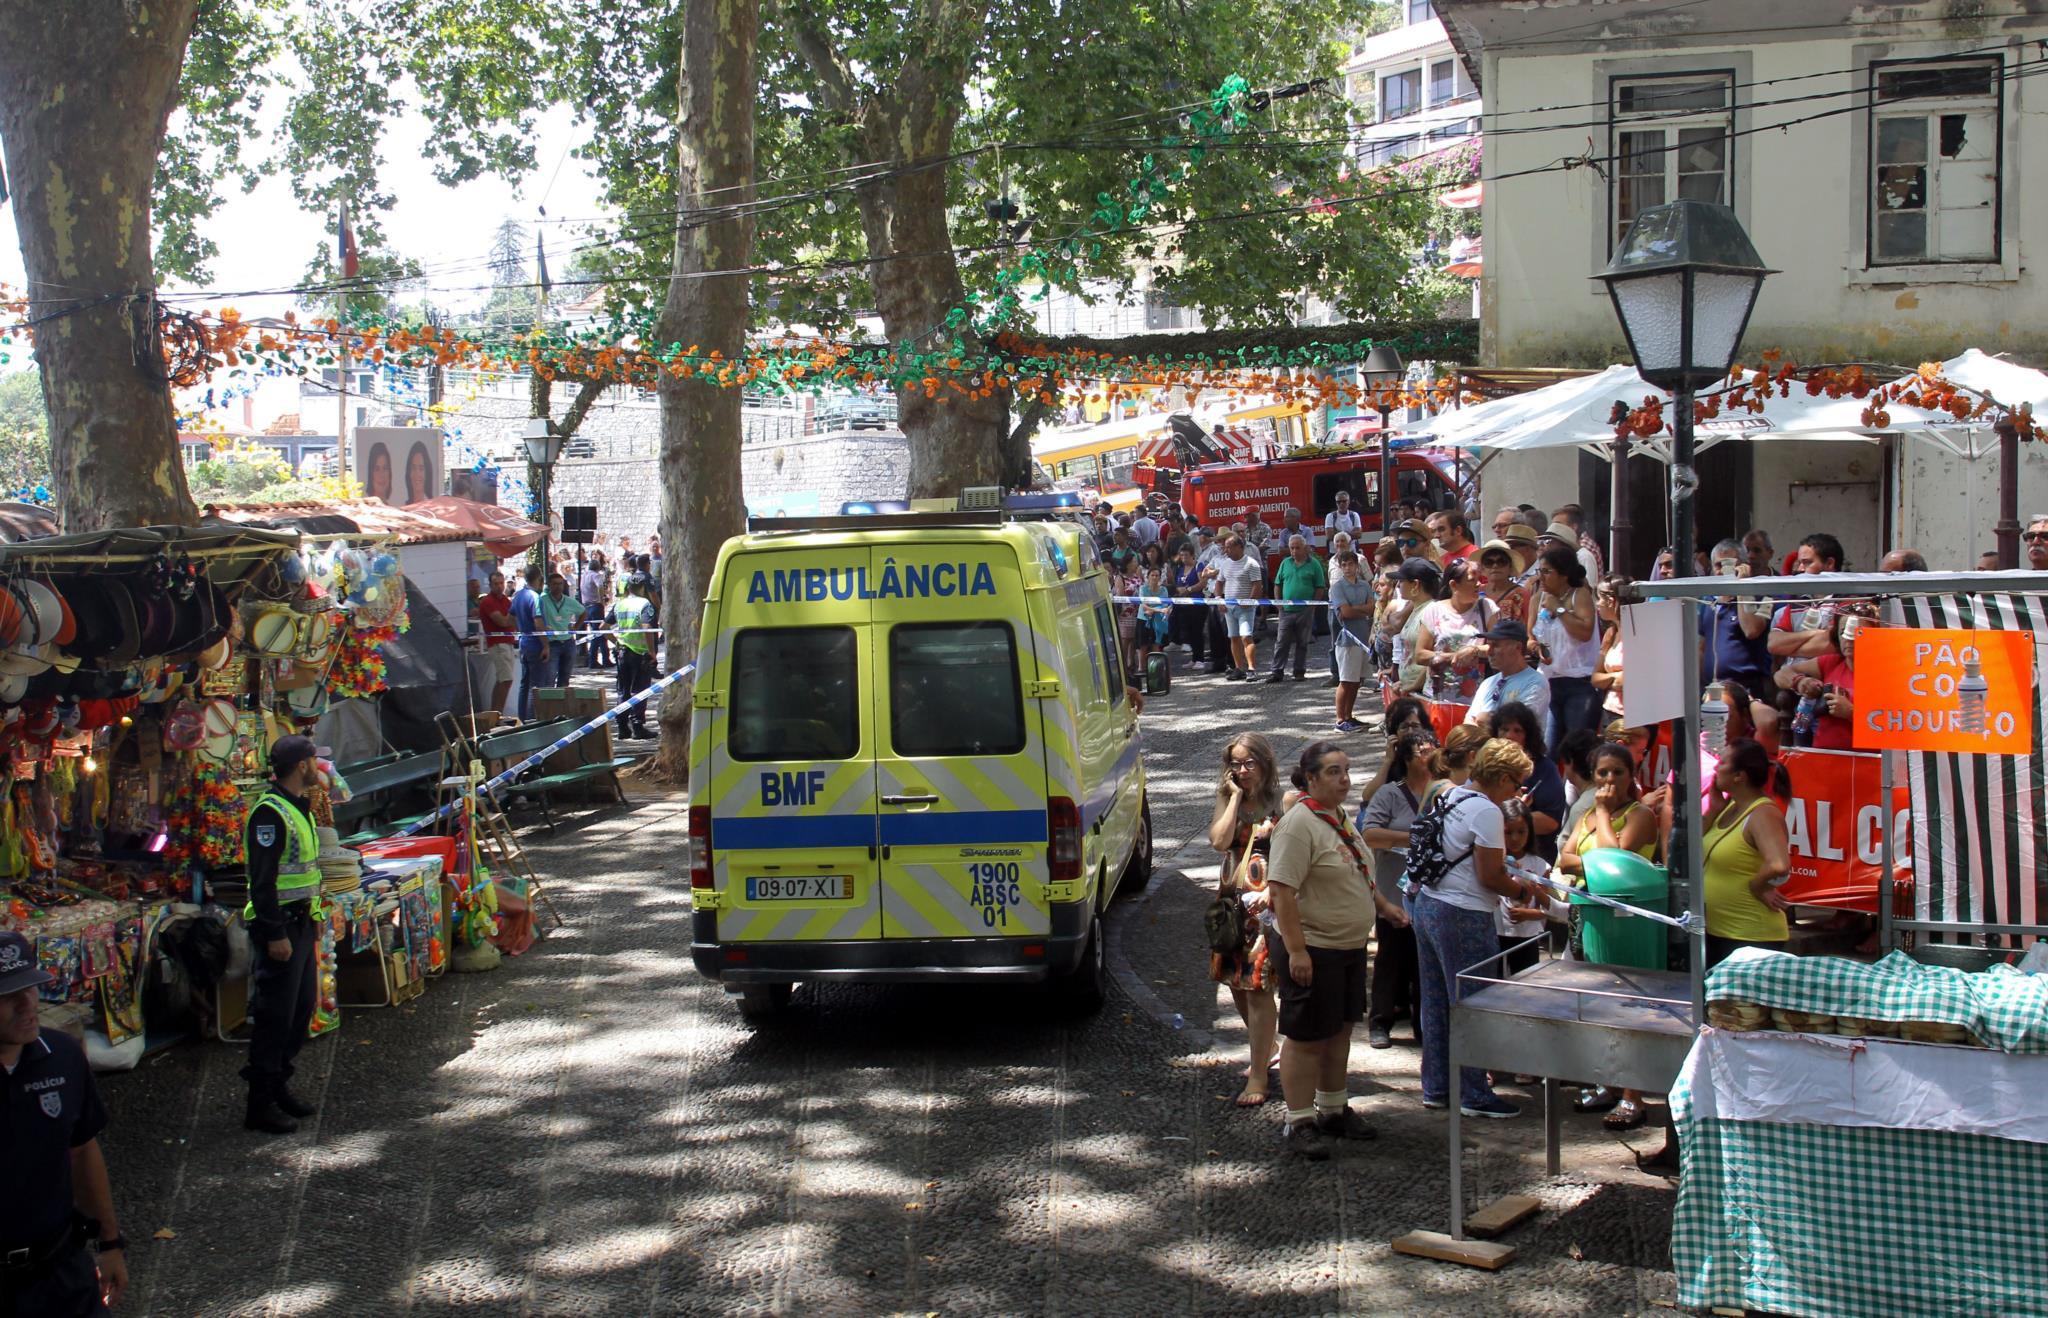 An ambulance leave the site. / Publico